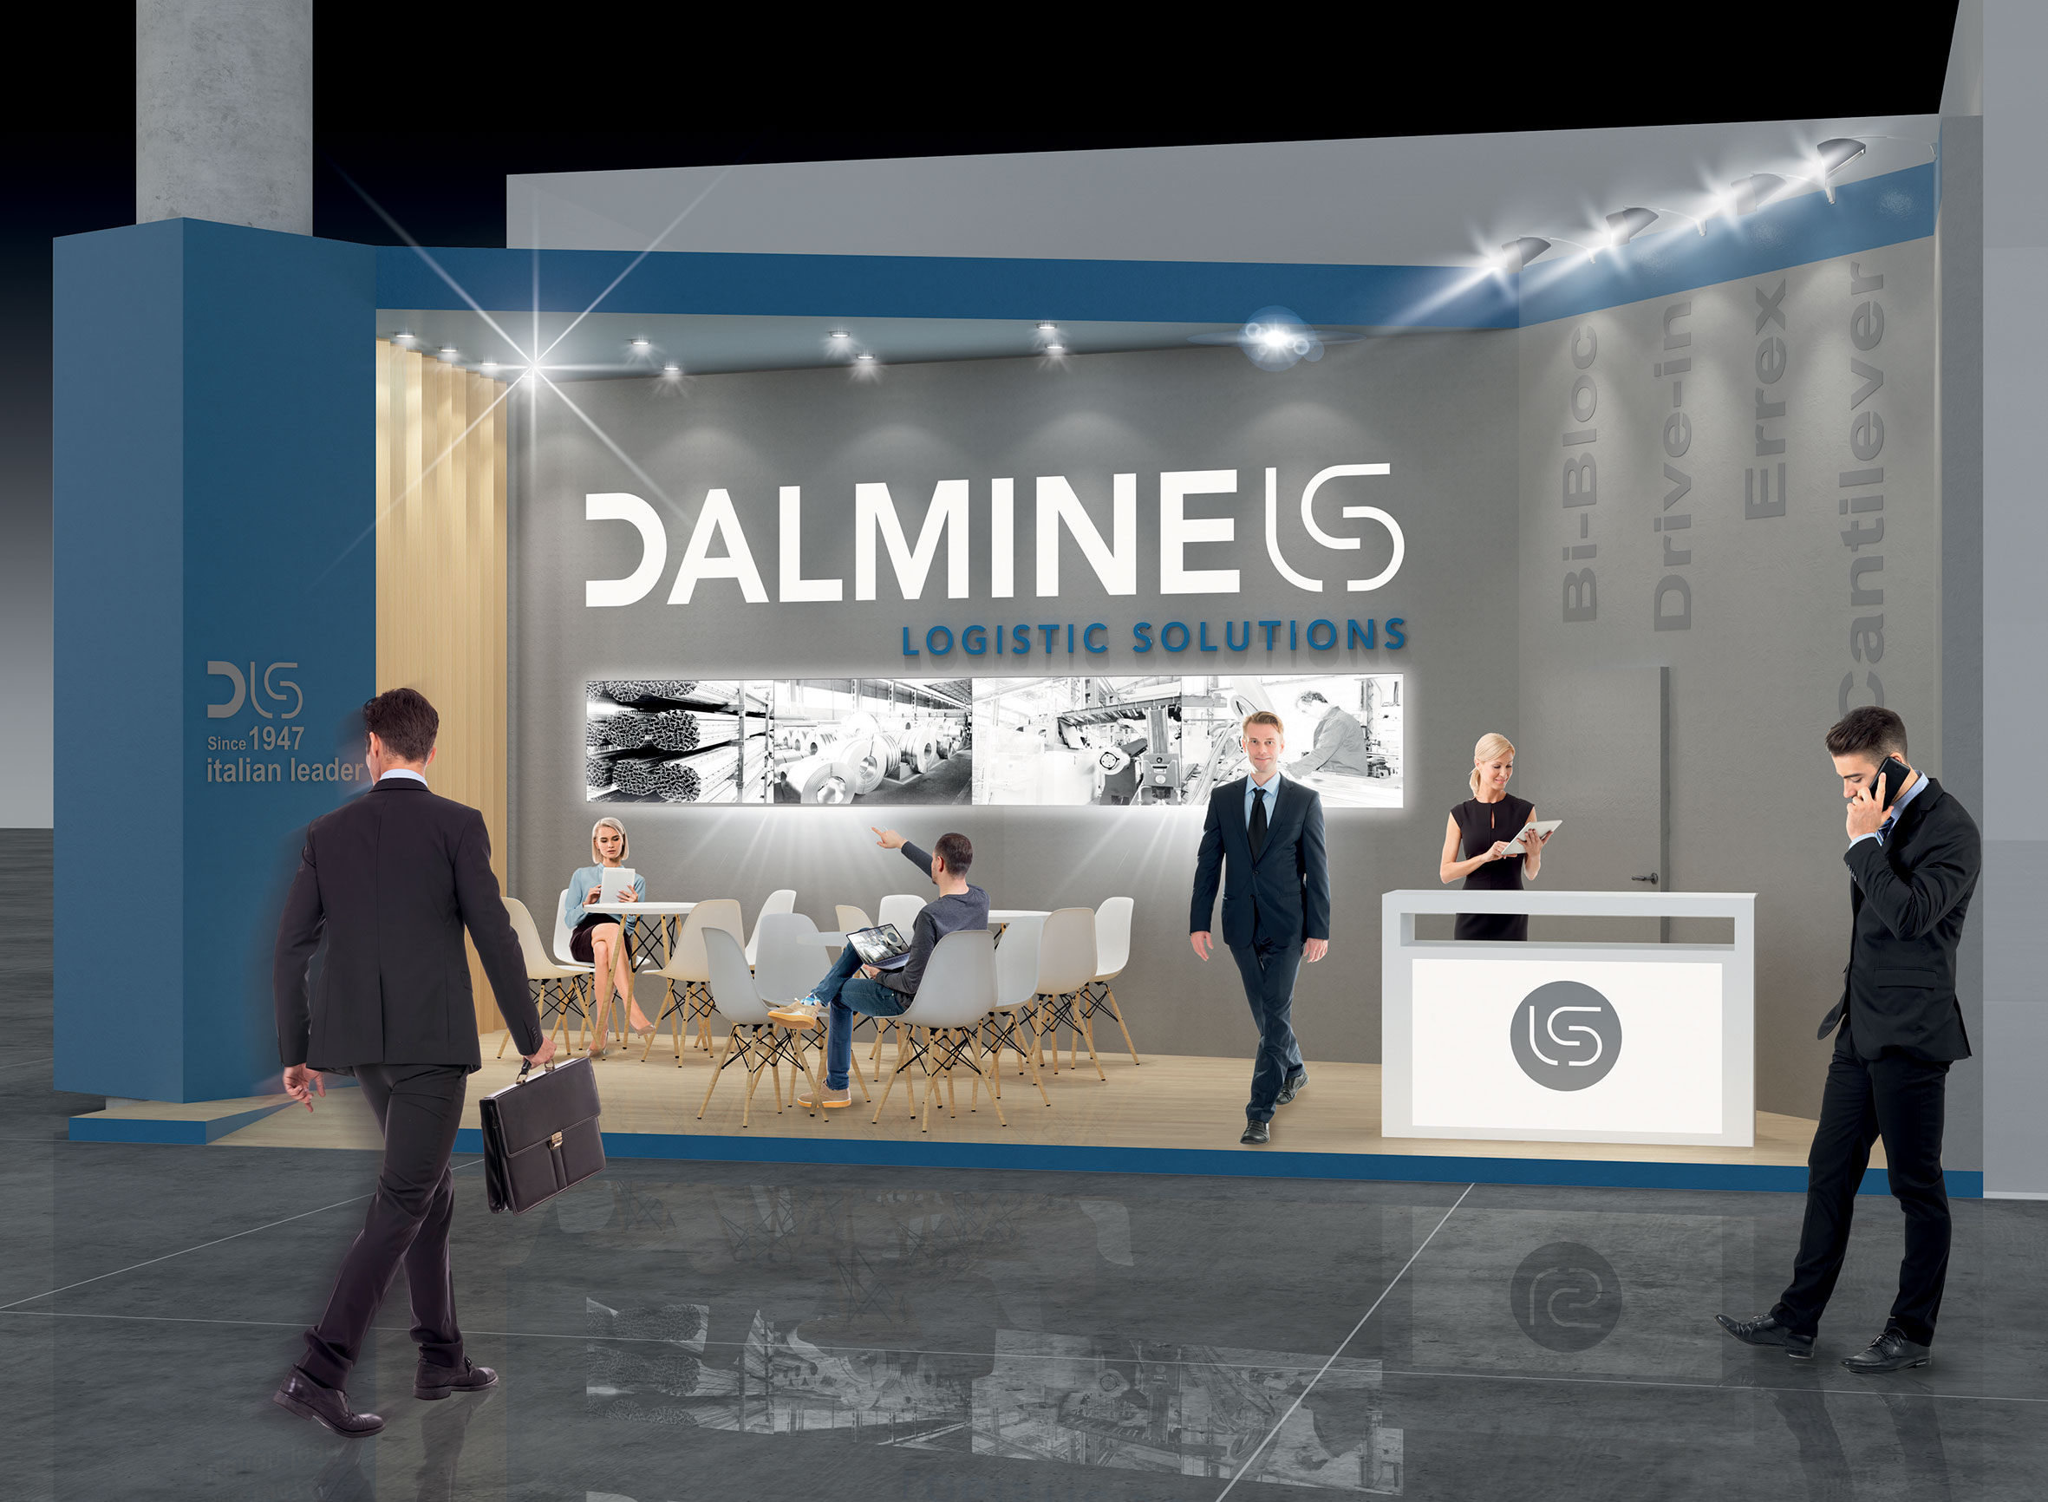 SC-Studio-Chiesa-Communication_Logistica-DLS-Dalmine-Logistic-Solutions-exhibition